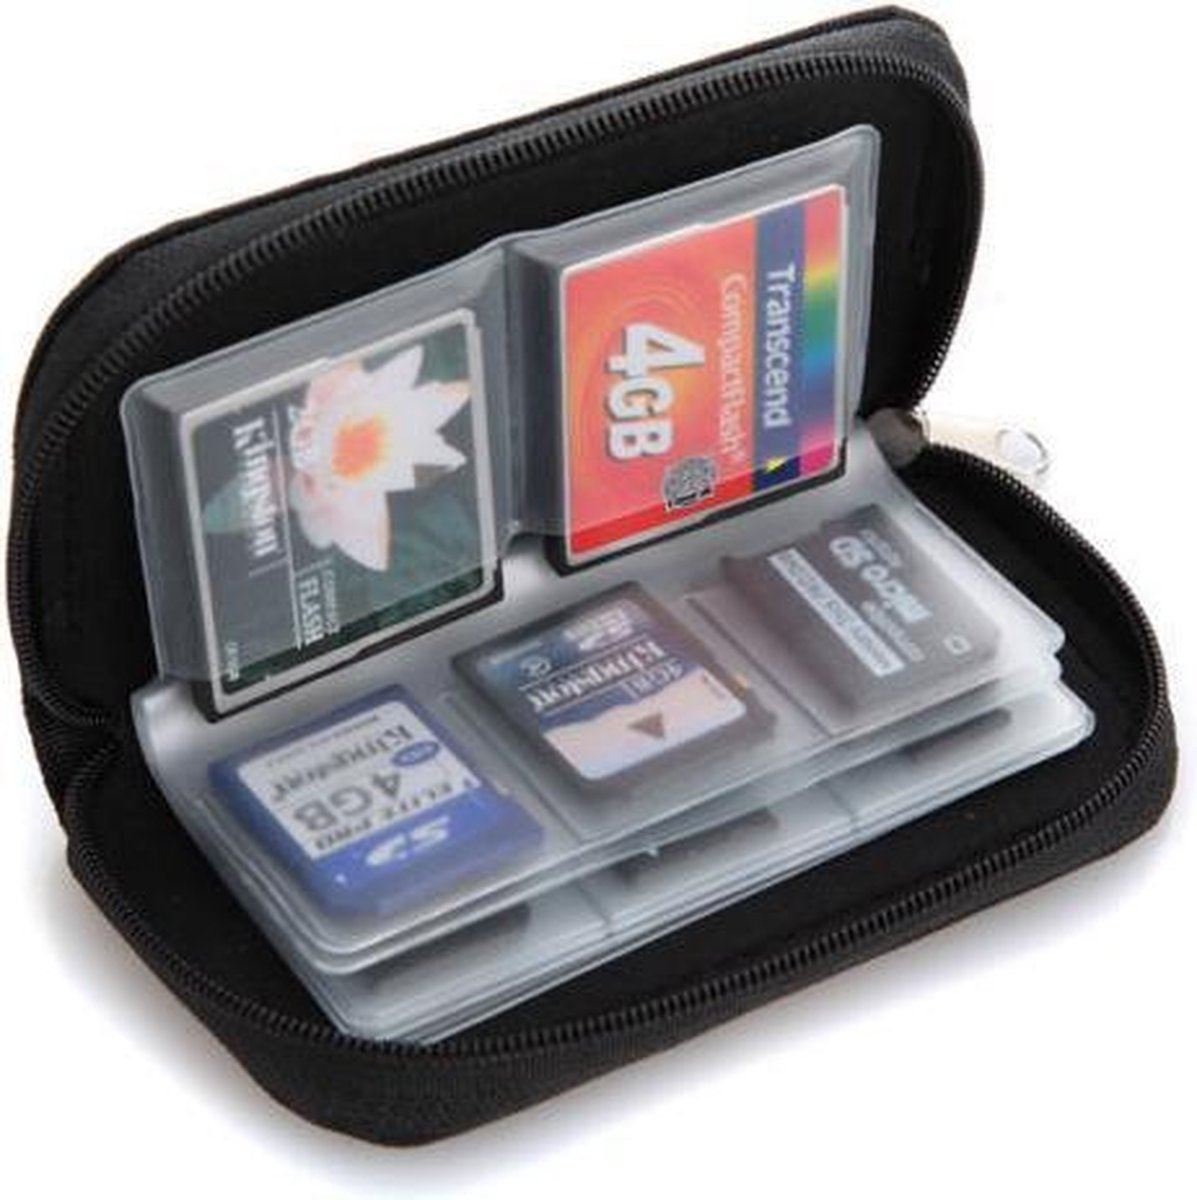 Sd kaart tasje/houder   22 kaarten   4 grote 18 kleine slots